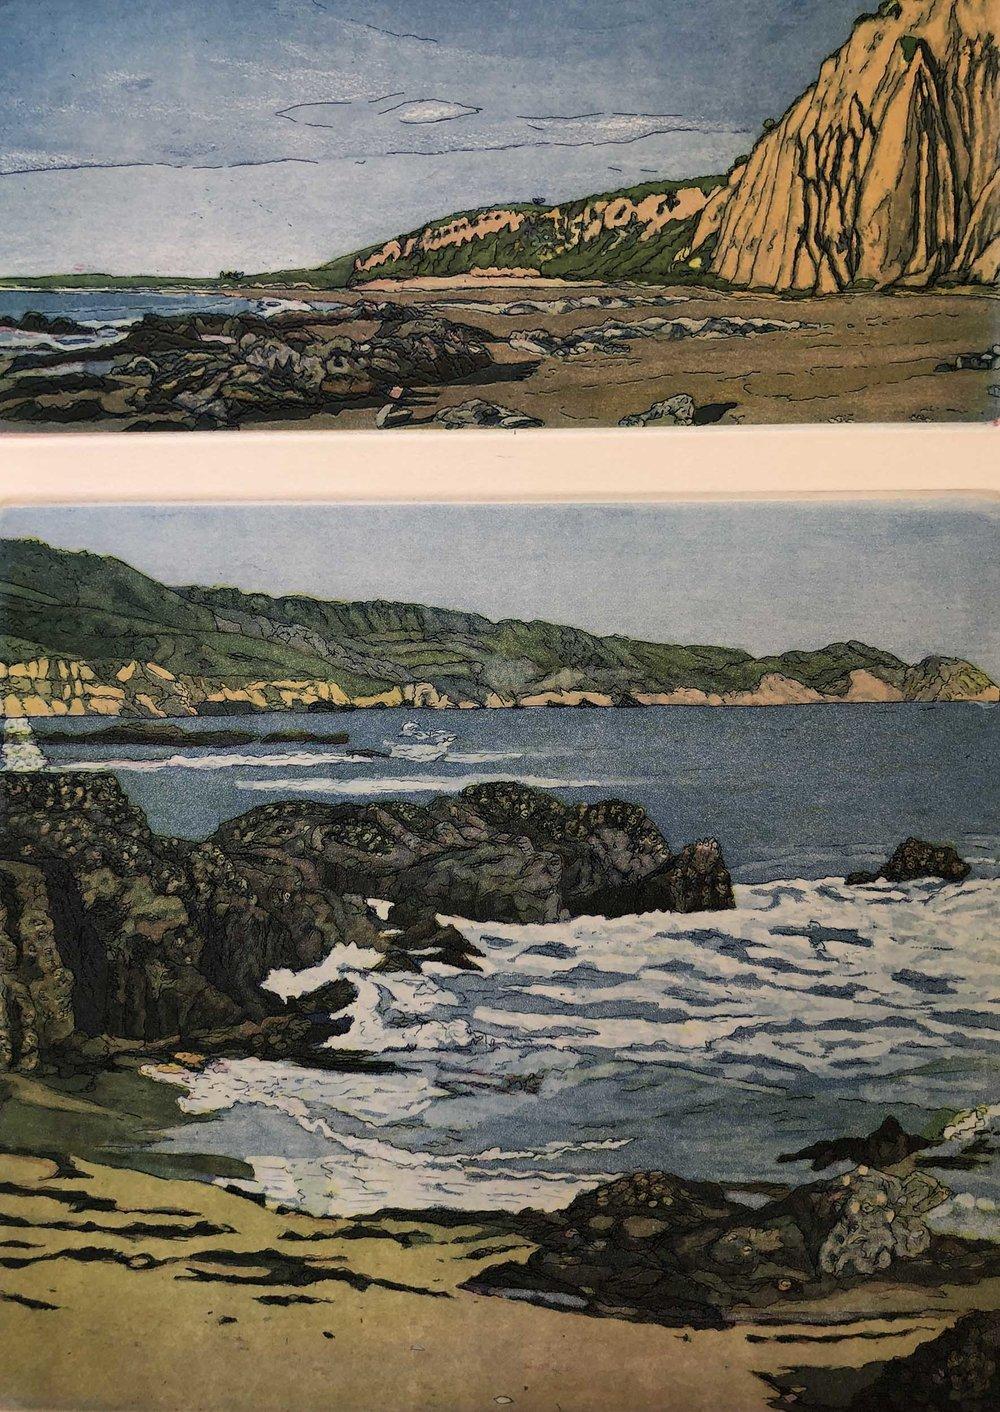 Coast Walk IV: Pt. Reyes National Seashore